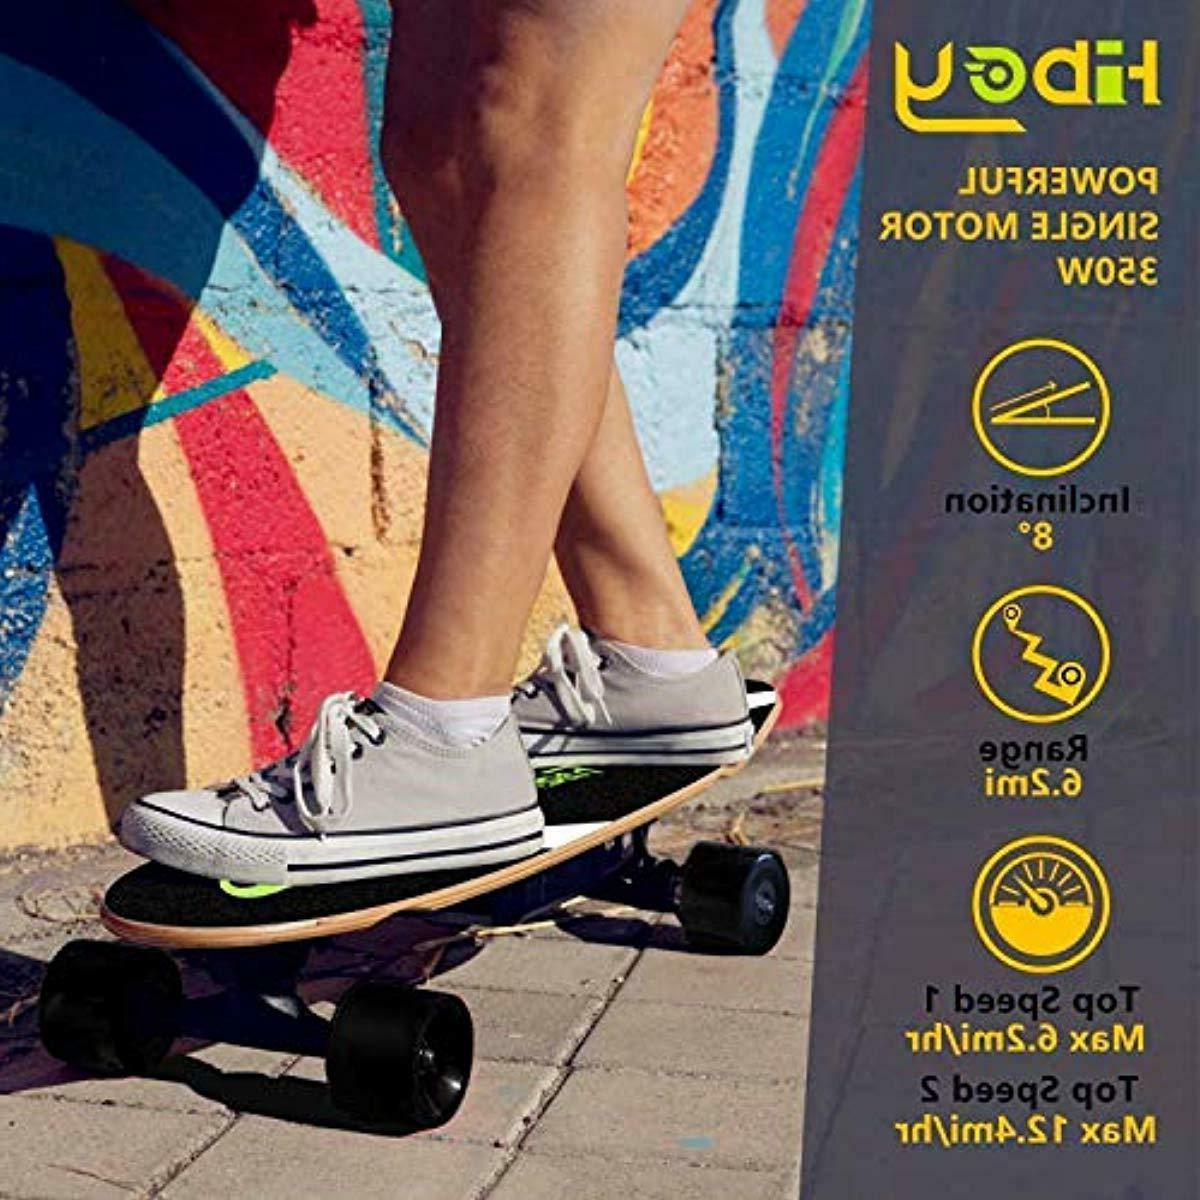 Hiboy Electric Scooter Skateboard with Wireless Longboard